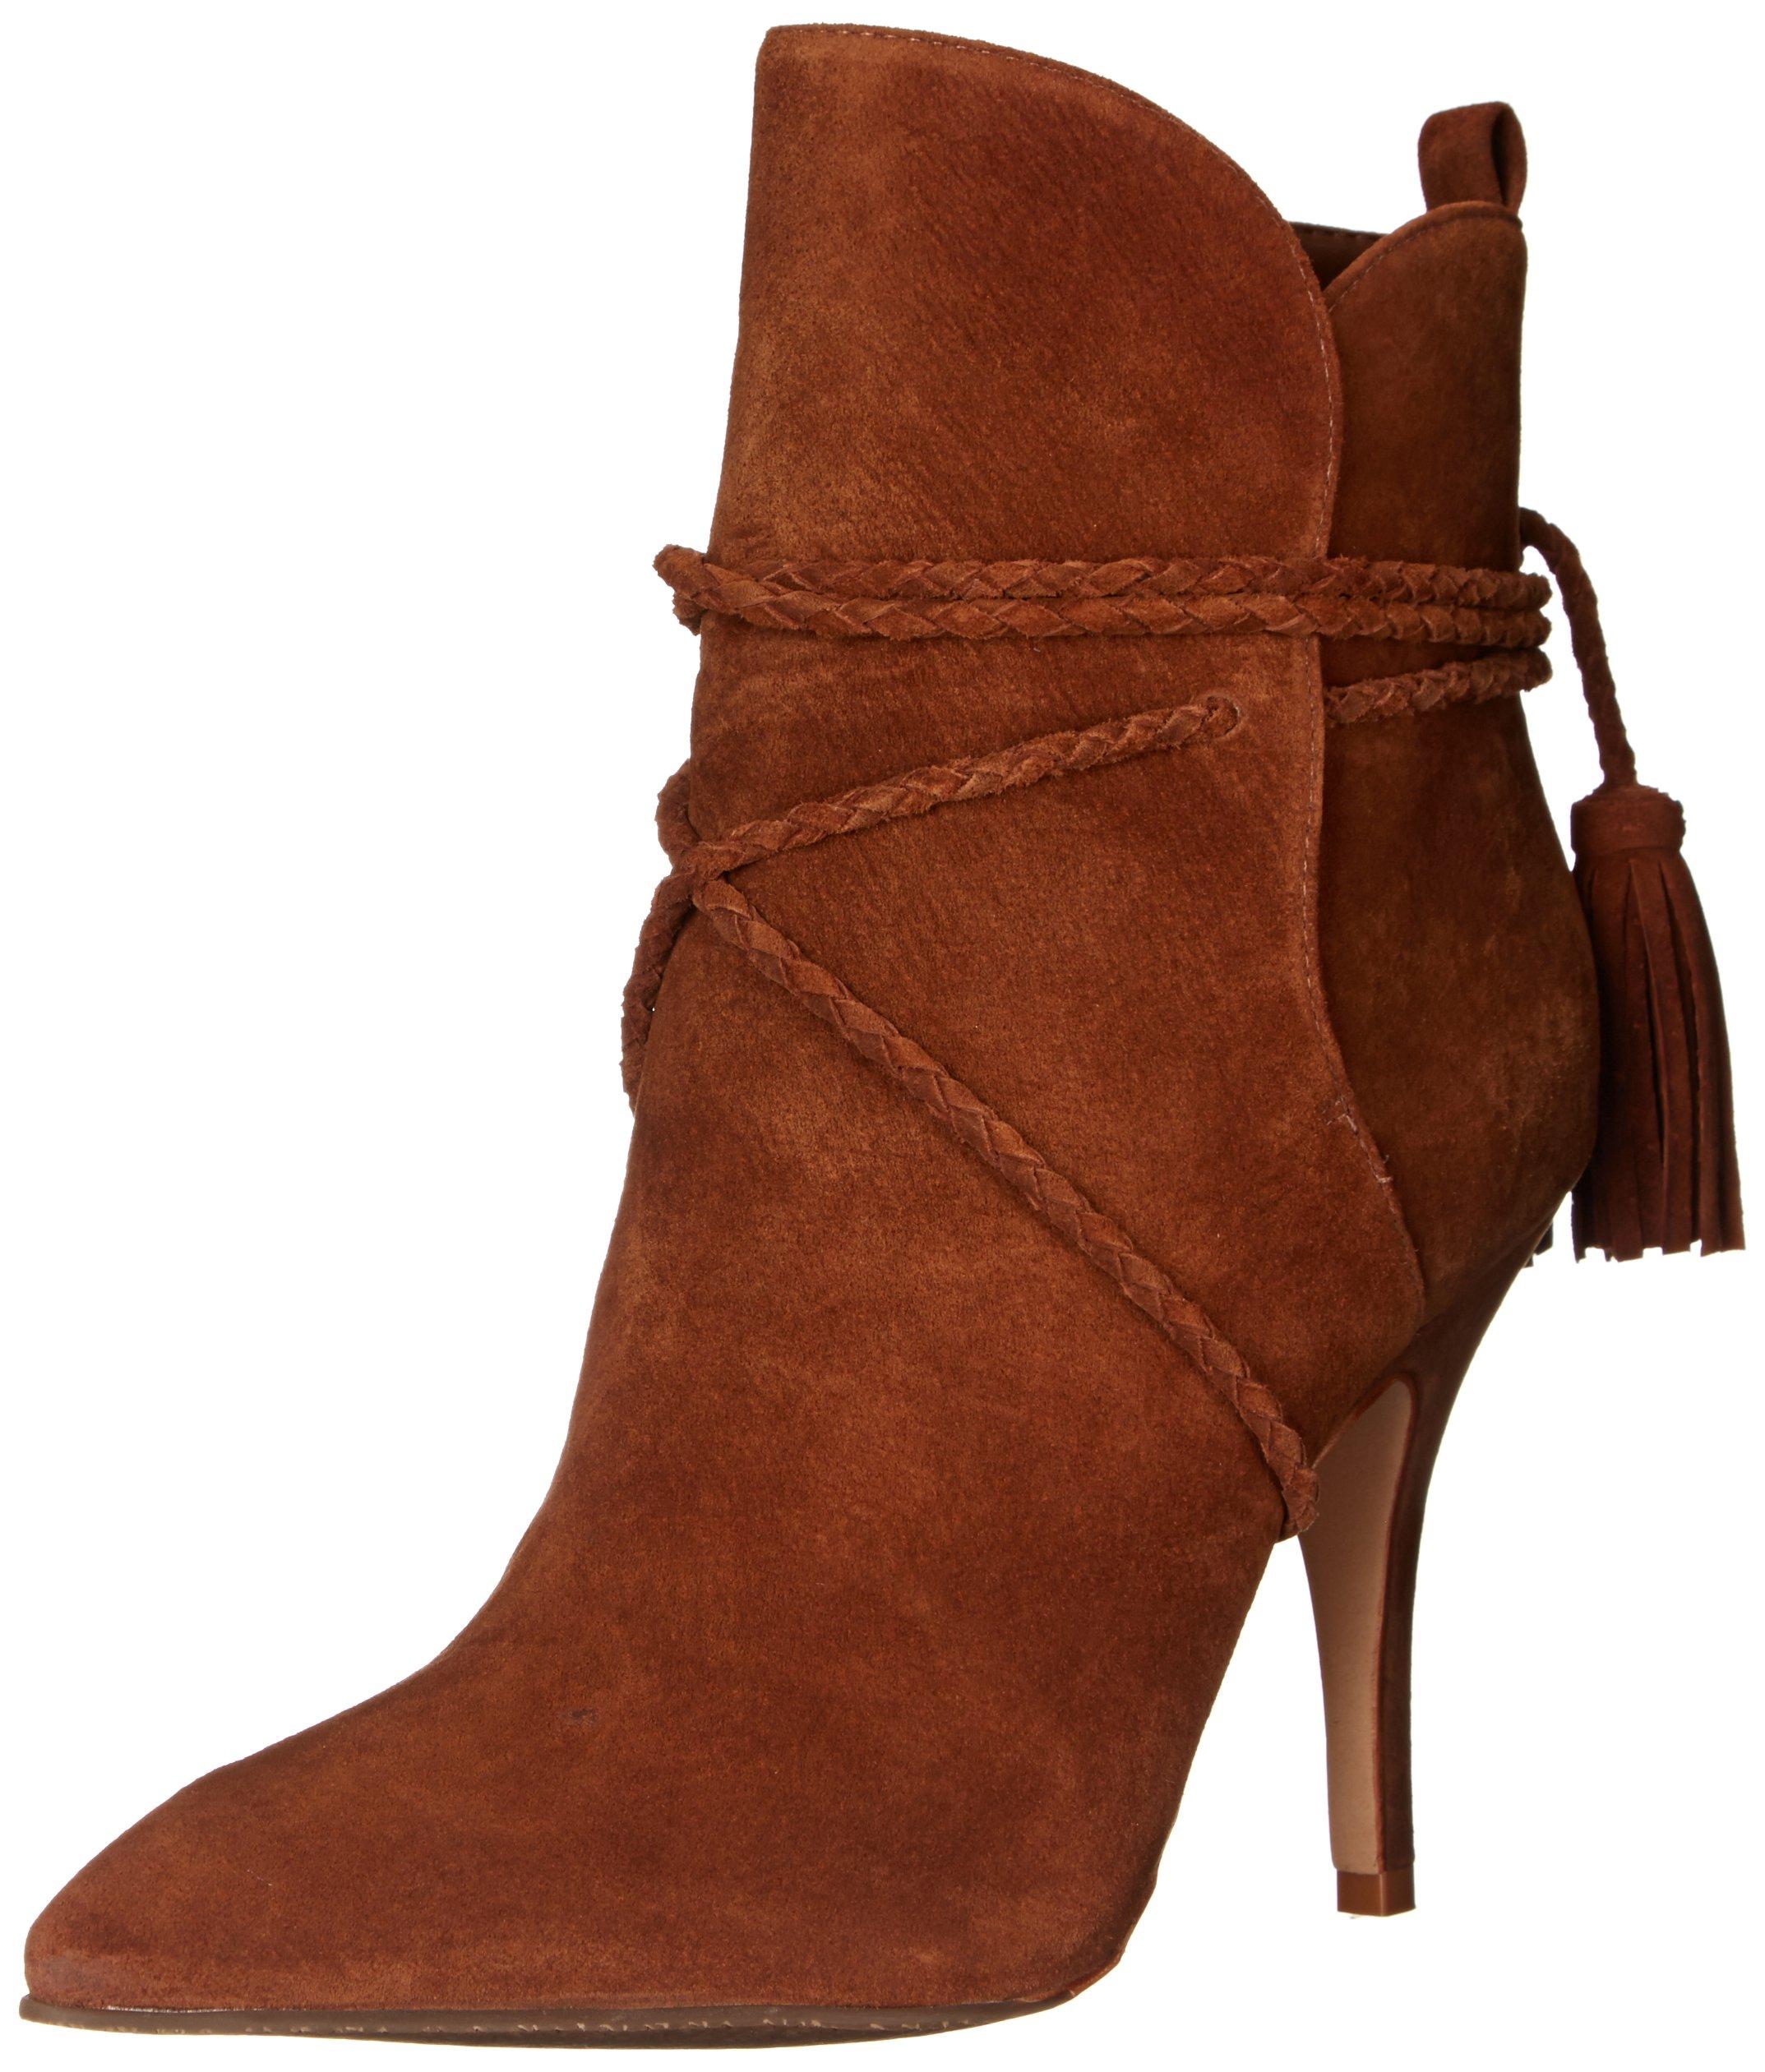 SCHUTZ Women's Fadhila Western Boot, Wood, 8 M US